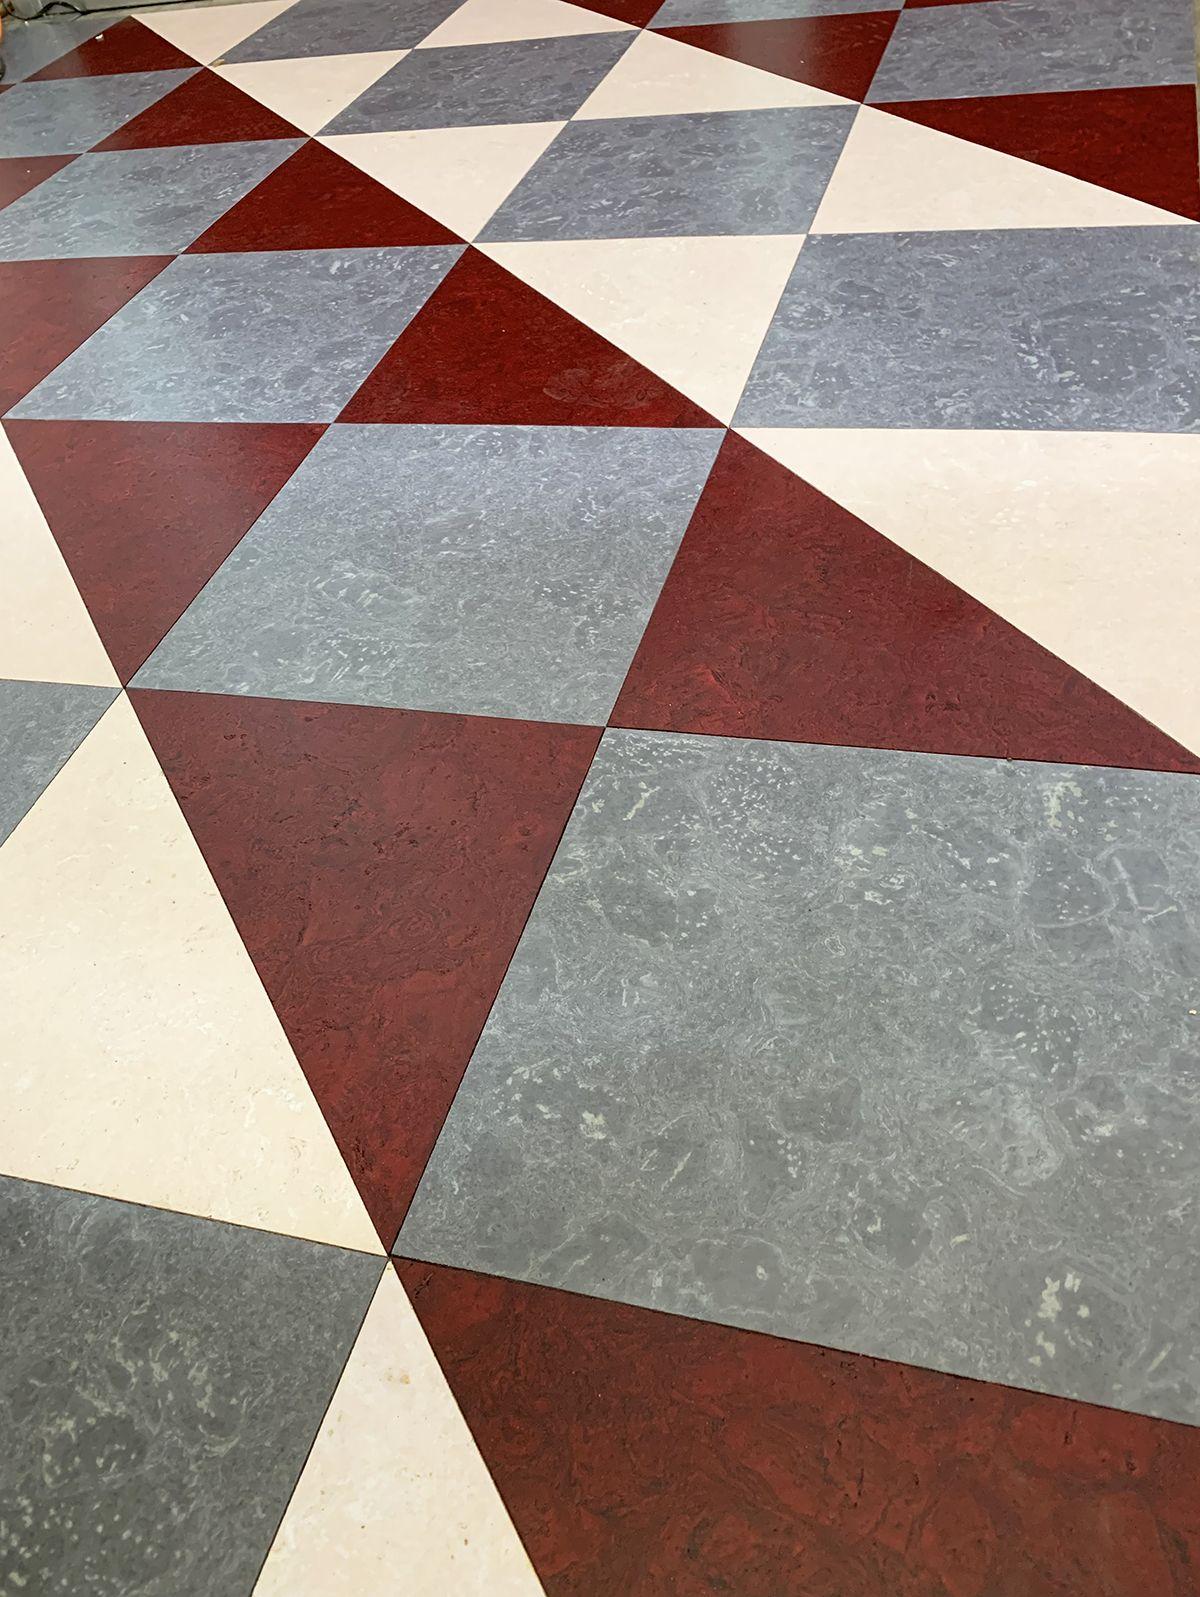 Globus Cork Eco Friendly Flooring Brooklyn Ny Cork Tiles Cork Wall Tiles Cork Wood